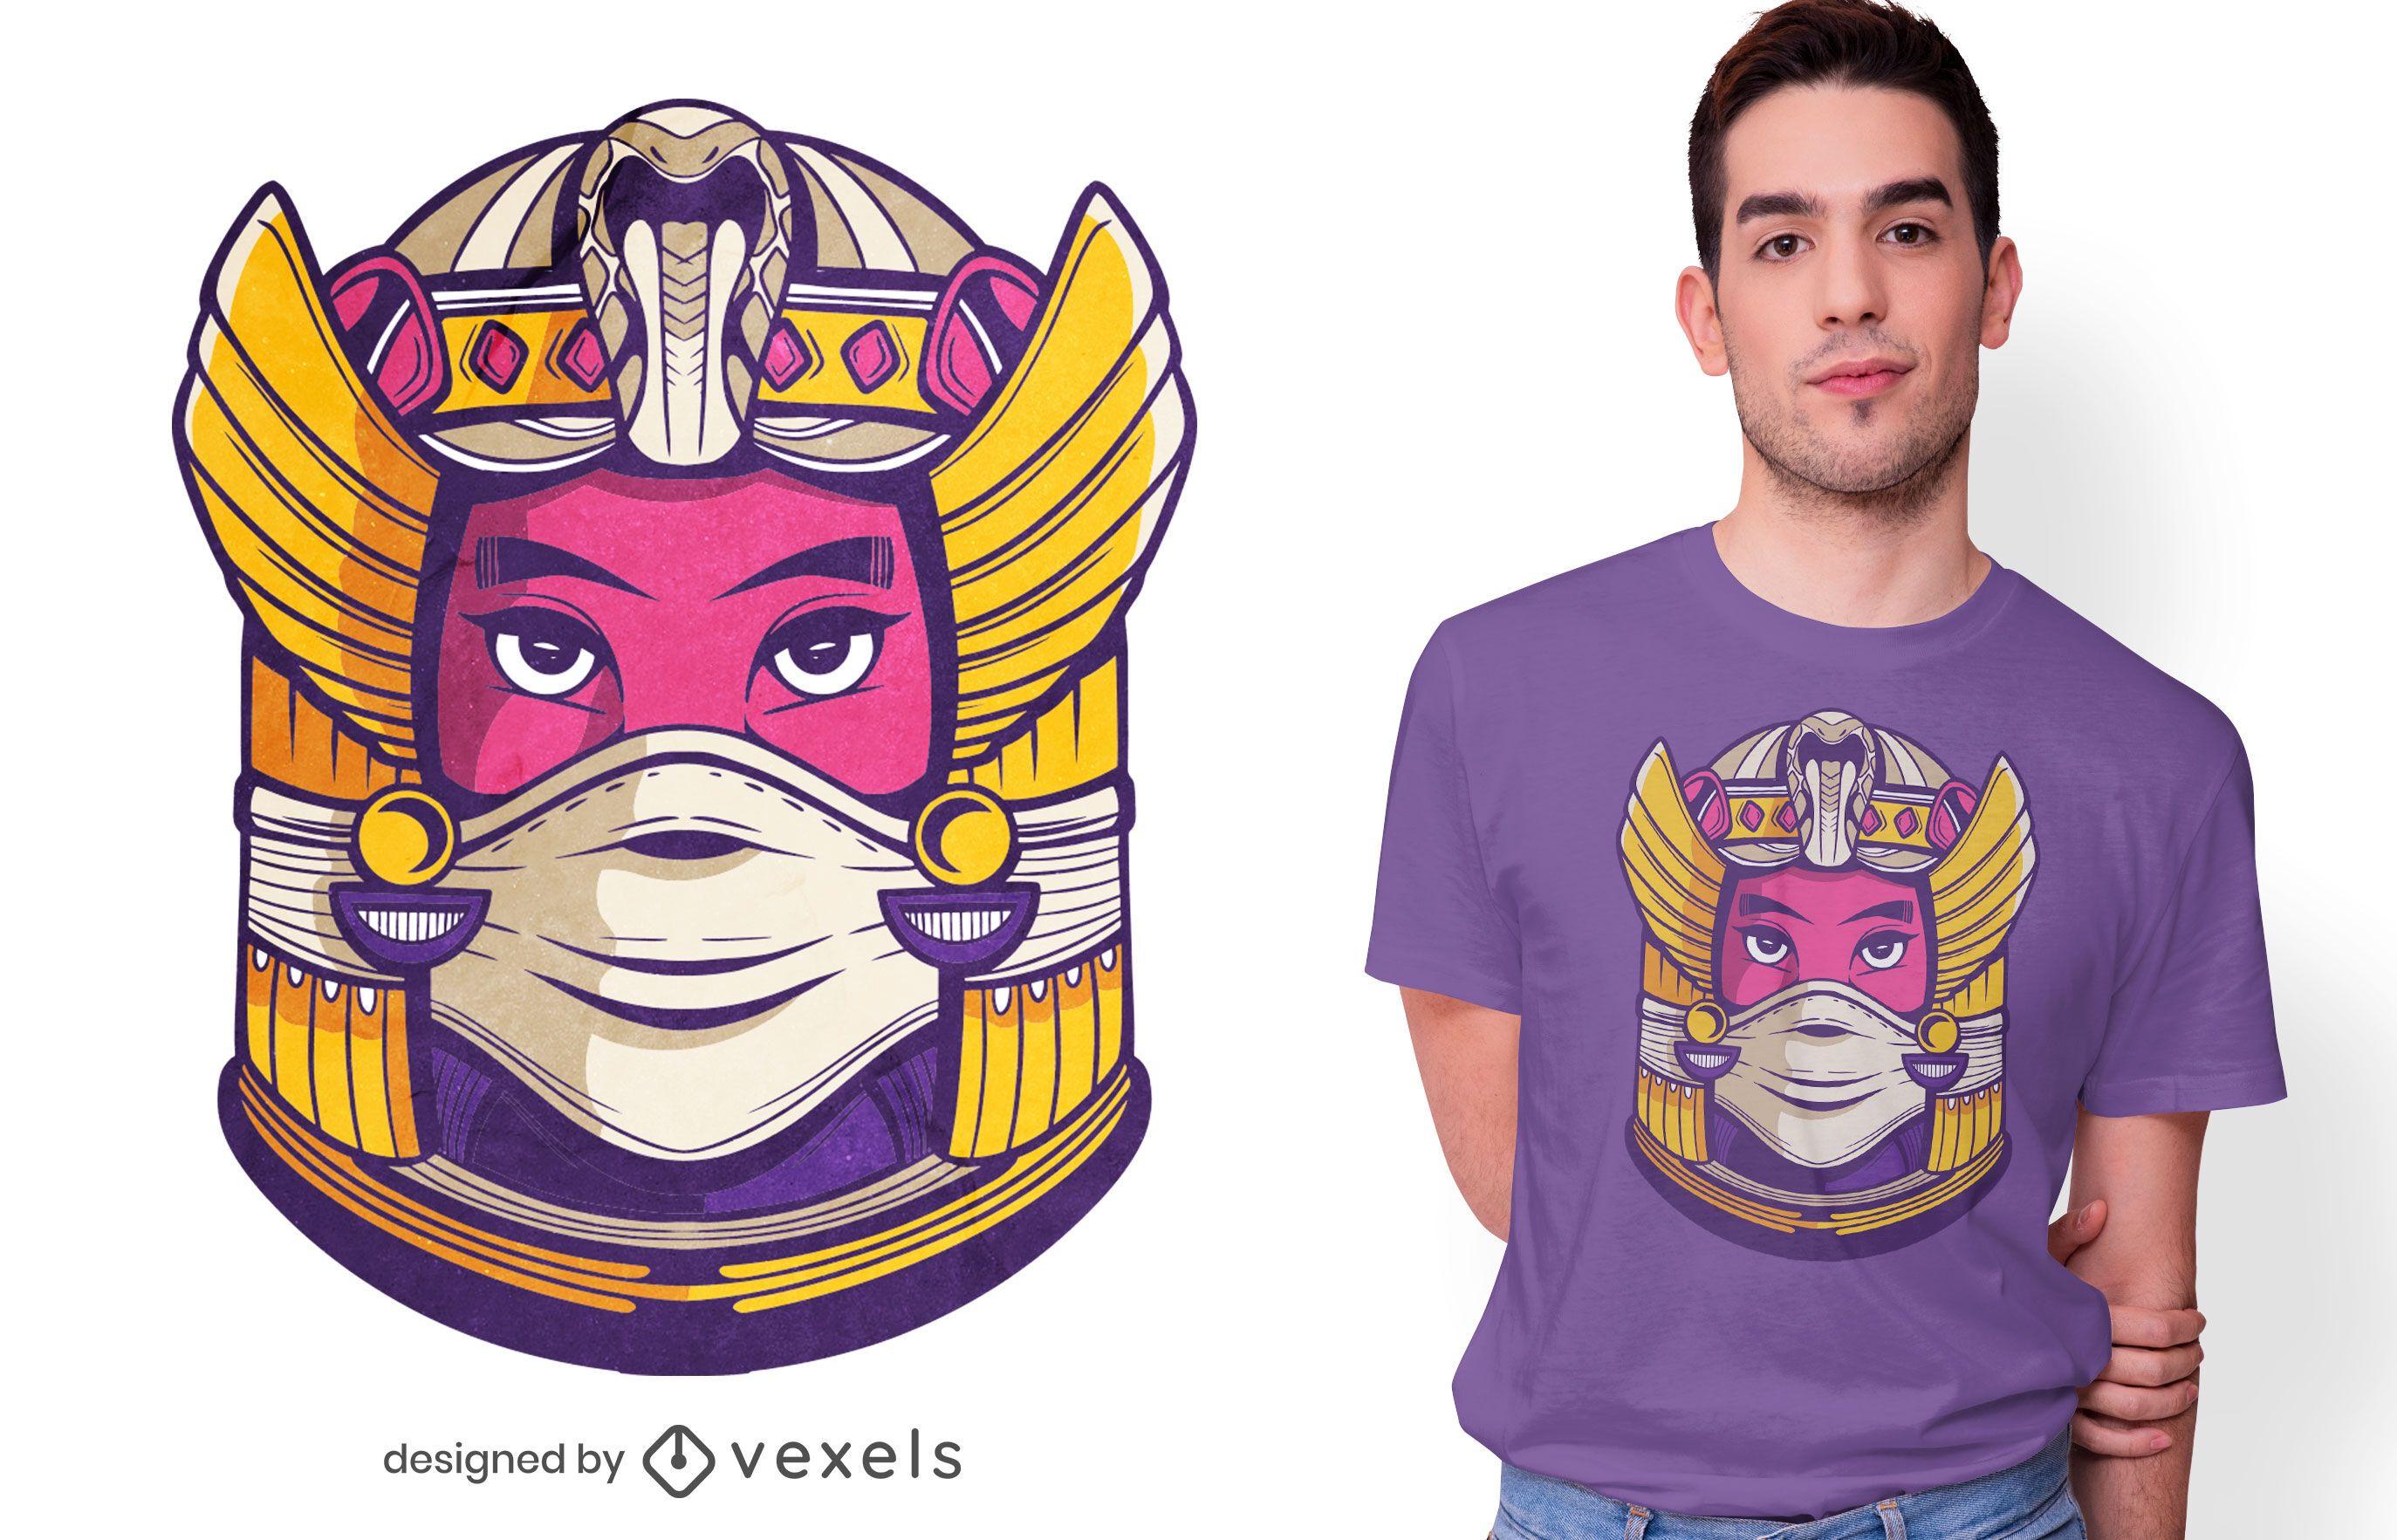 Cleopatra face mask t-shirt design